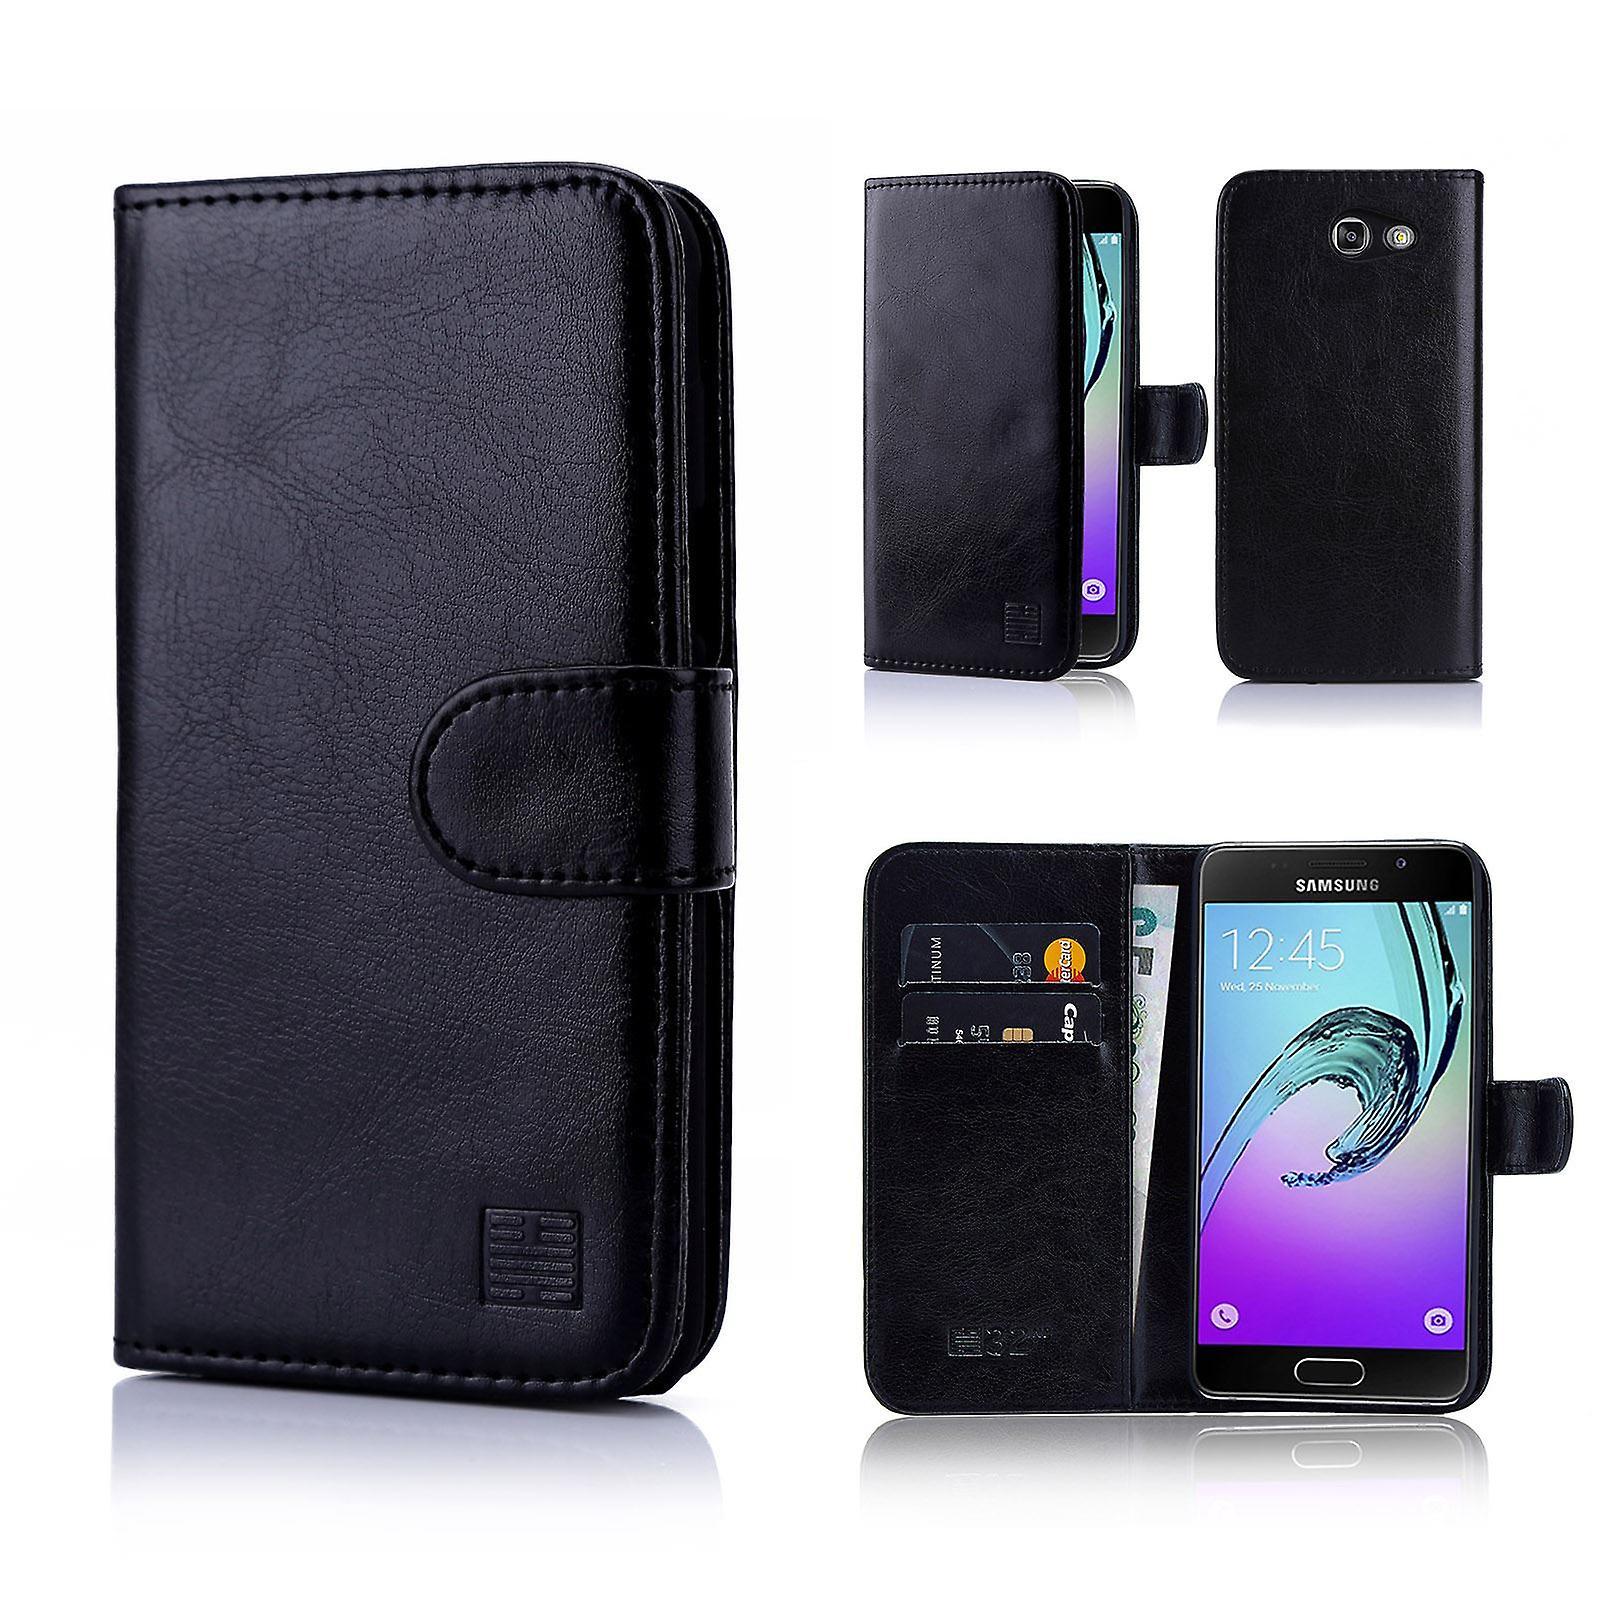 32nd Book wallet case + stylus for Samsung Galaxy J3 (2017) J327P - Black